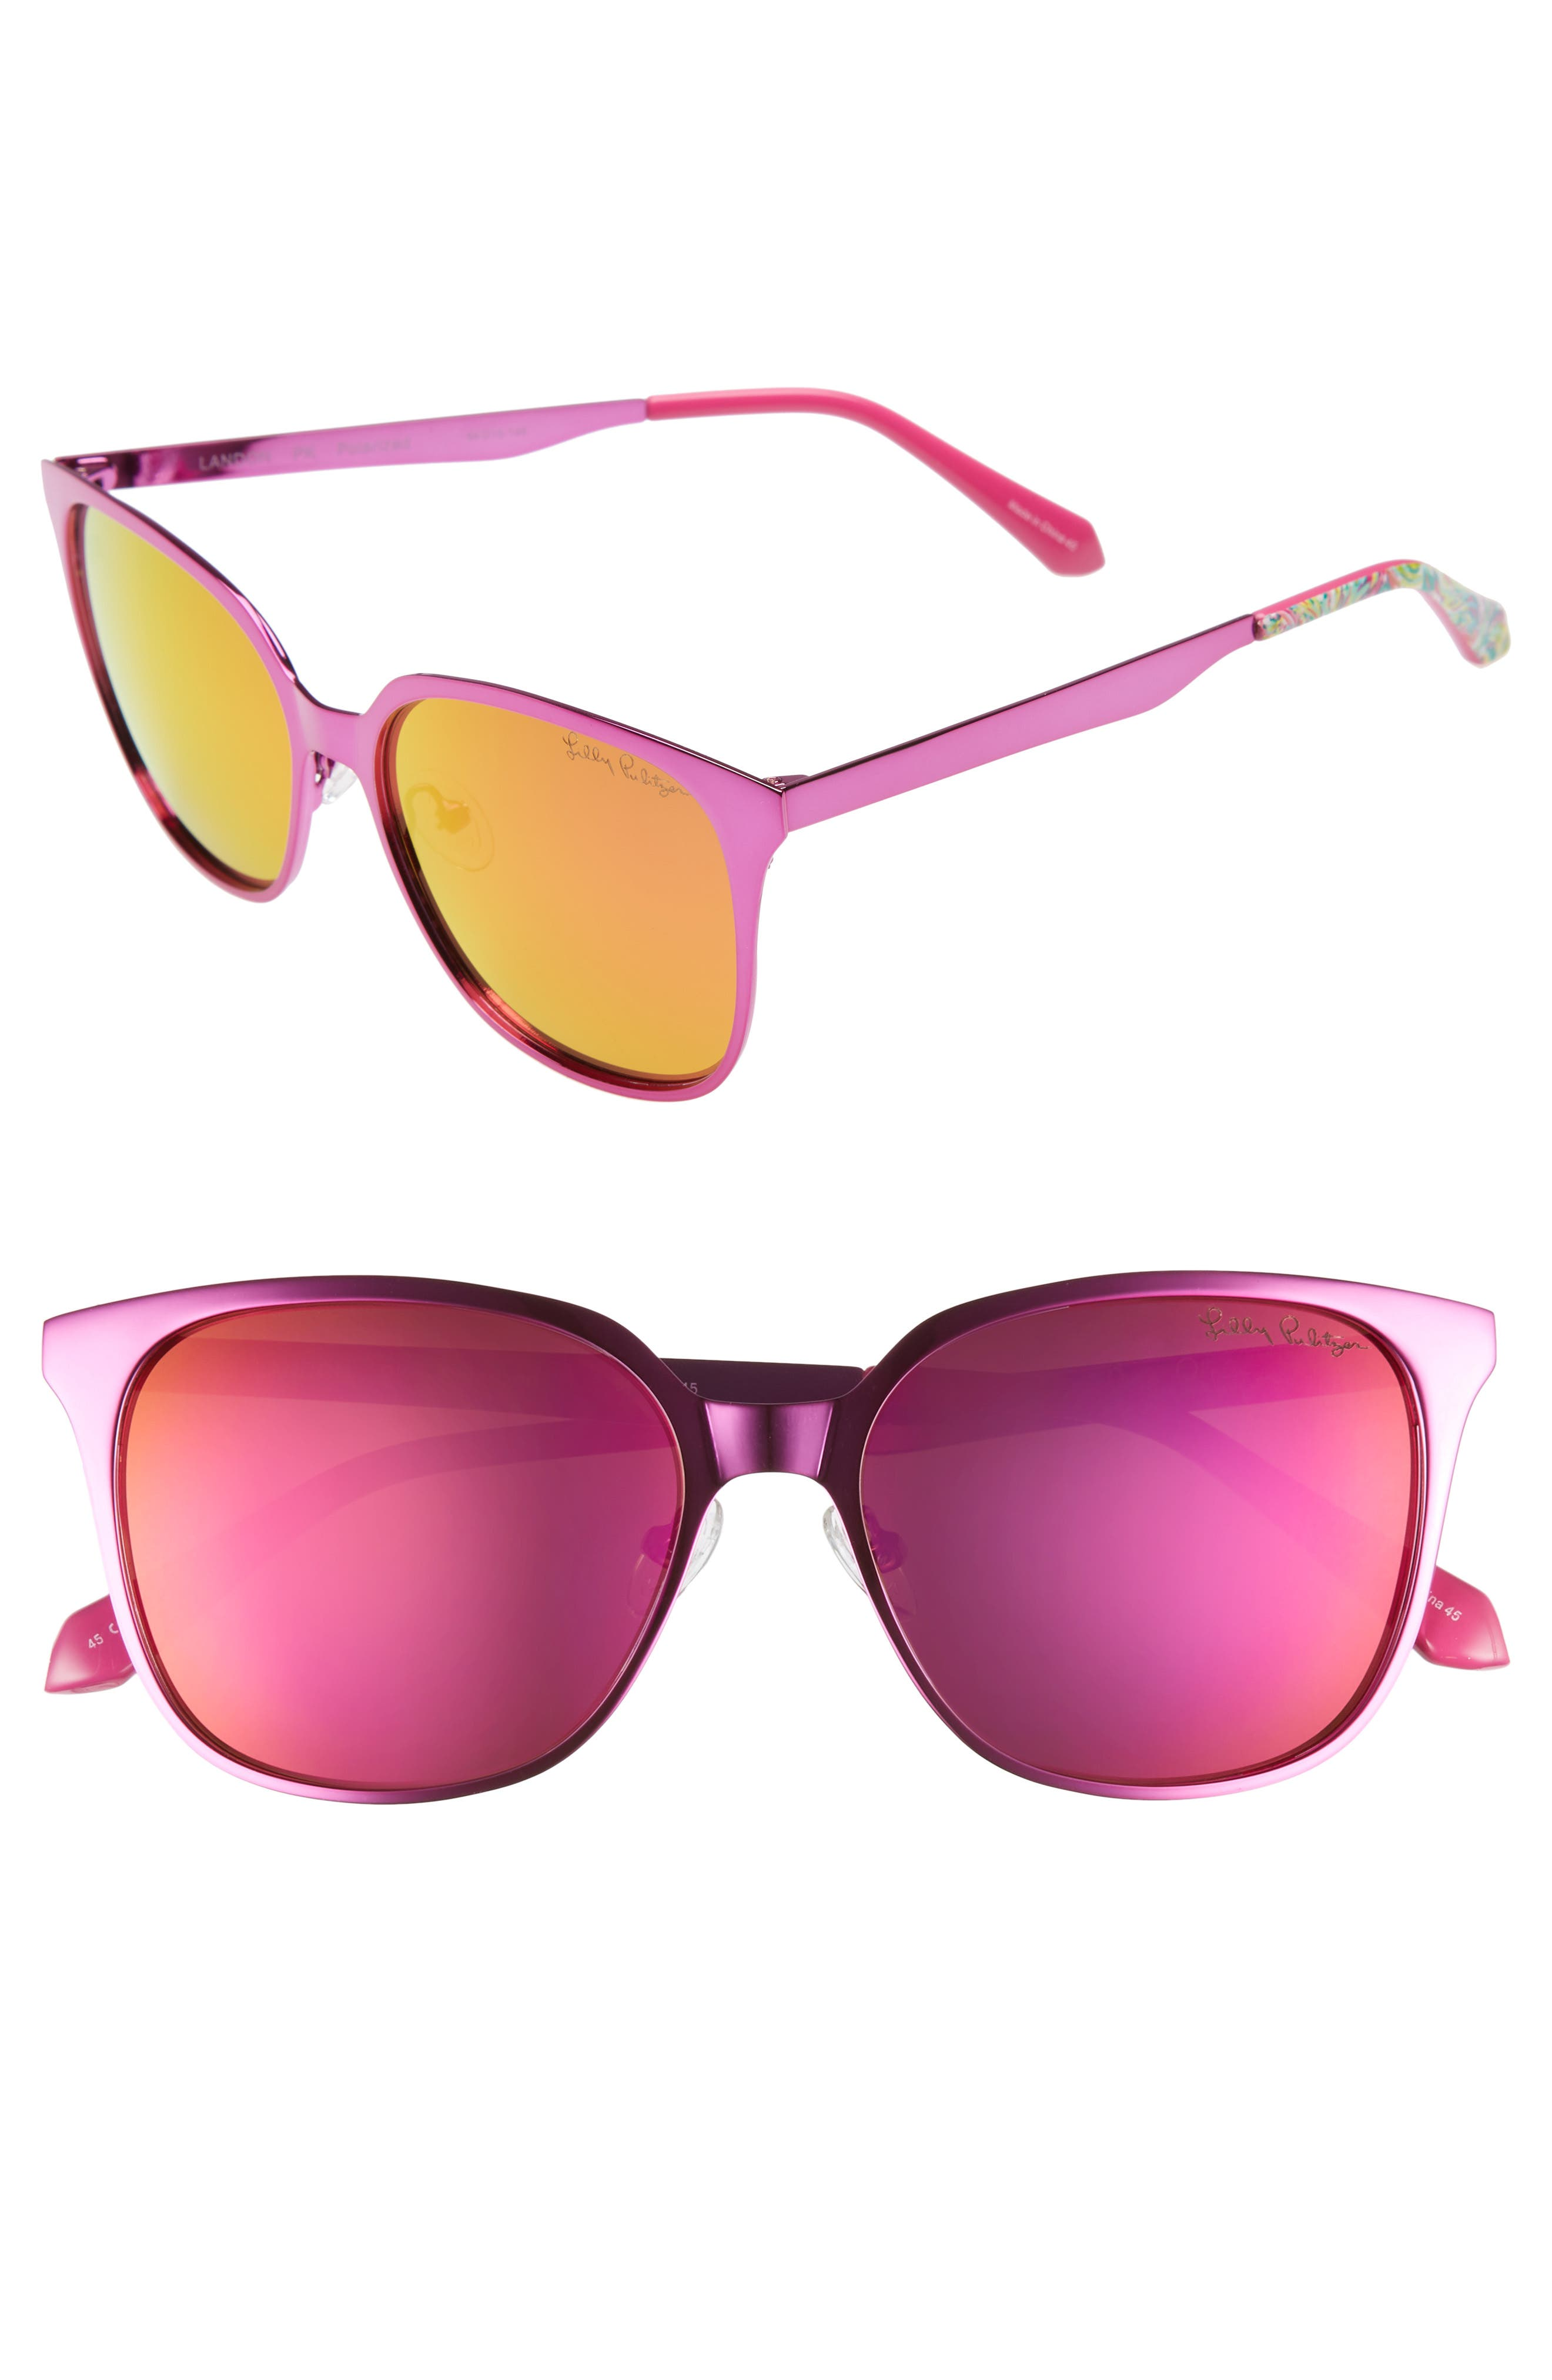 Lilly Pulitzer Landon 5m Polarized Sunglasses - Pink/ Pink